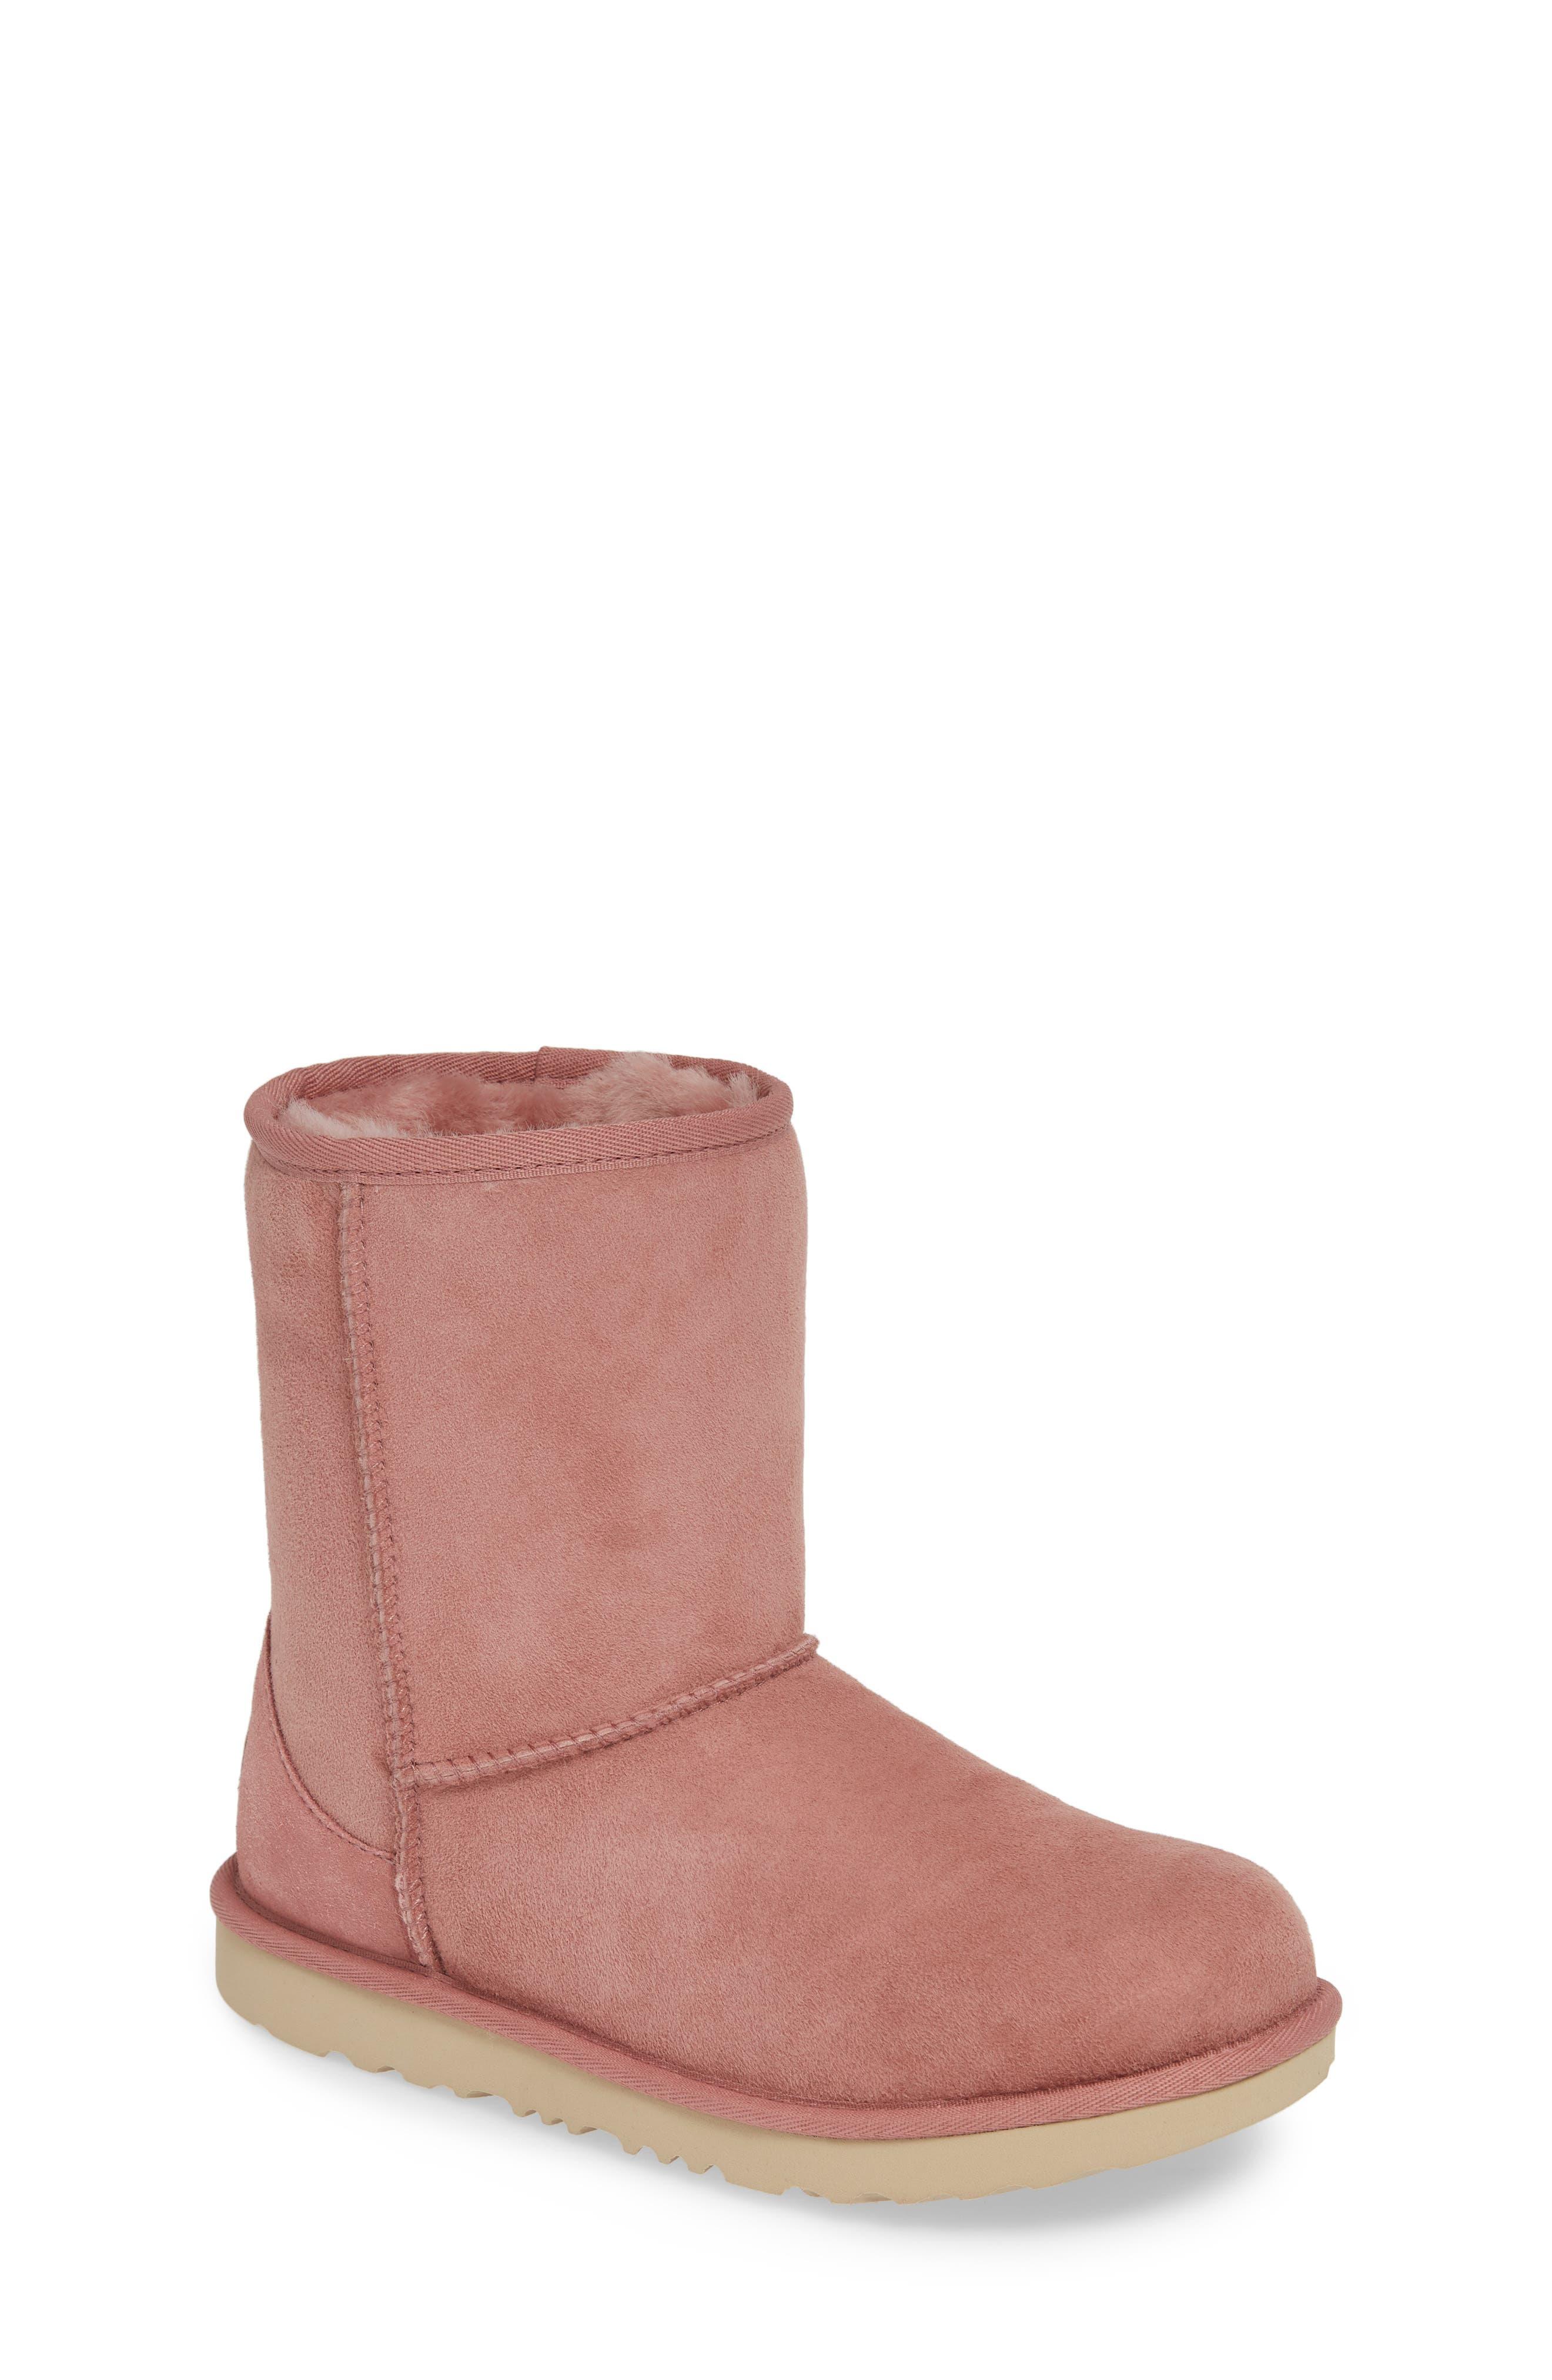 Classic Short II Water Resistant Genuine Shearling Boot, Main, color, PINK DAWN